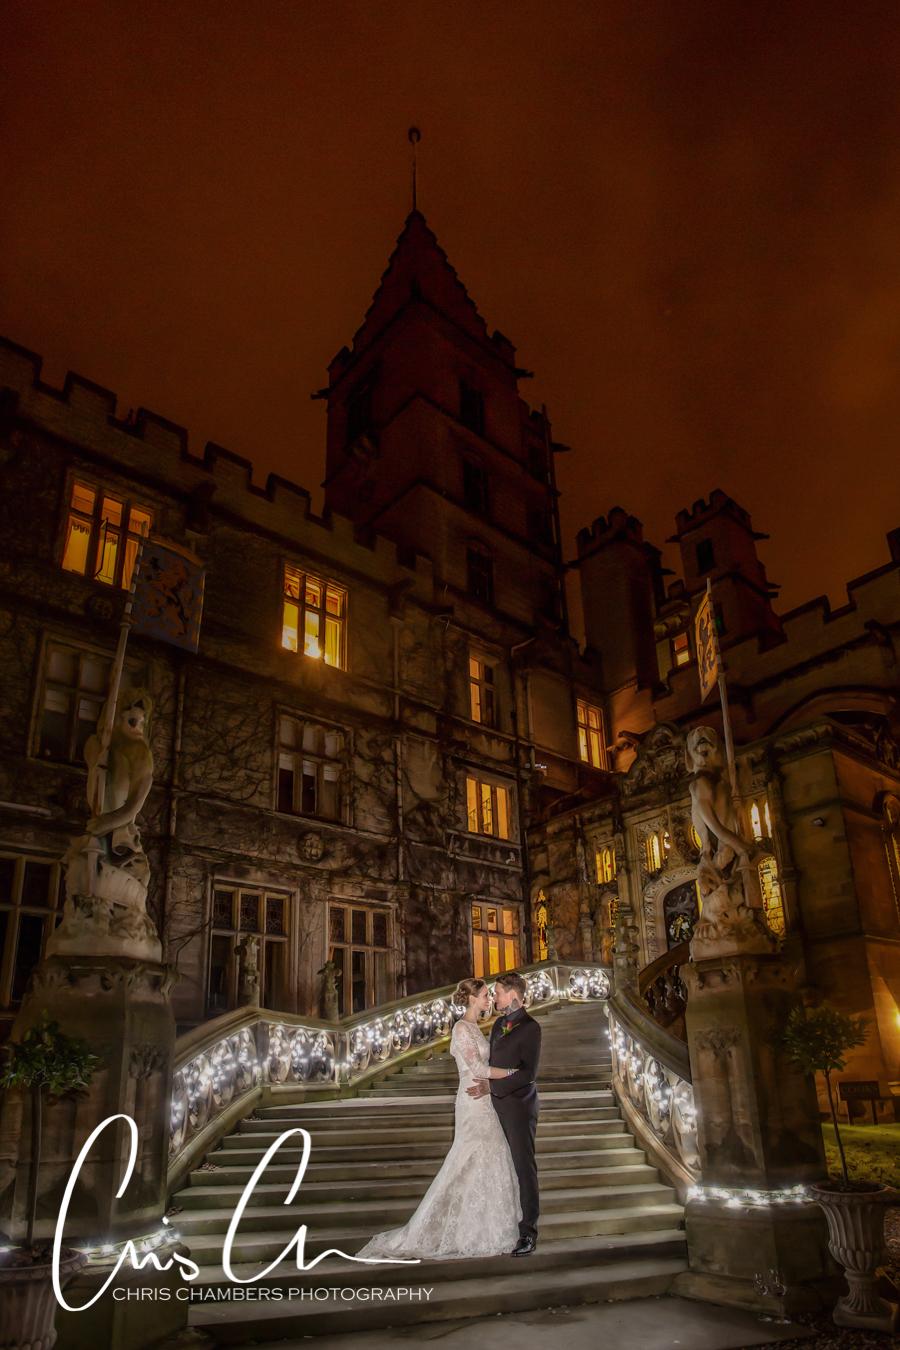 Carlton Towers Wedding Photographer, Award winning wedding photographs, Wedding Photography taken at Carlton Towers in Yorkshire, West Yorkshire wedding photography, Carlton Towers weddings, Bridal wedding photography